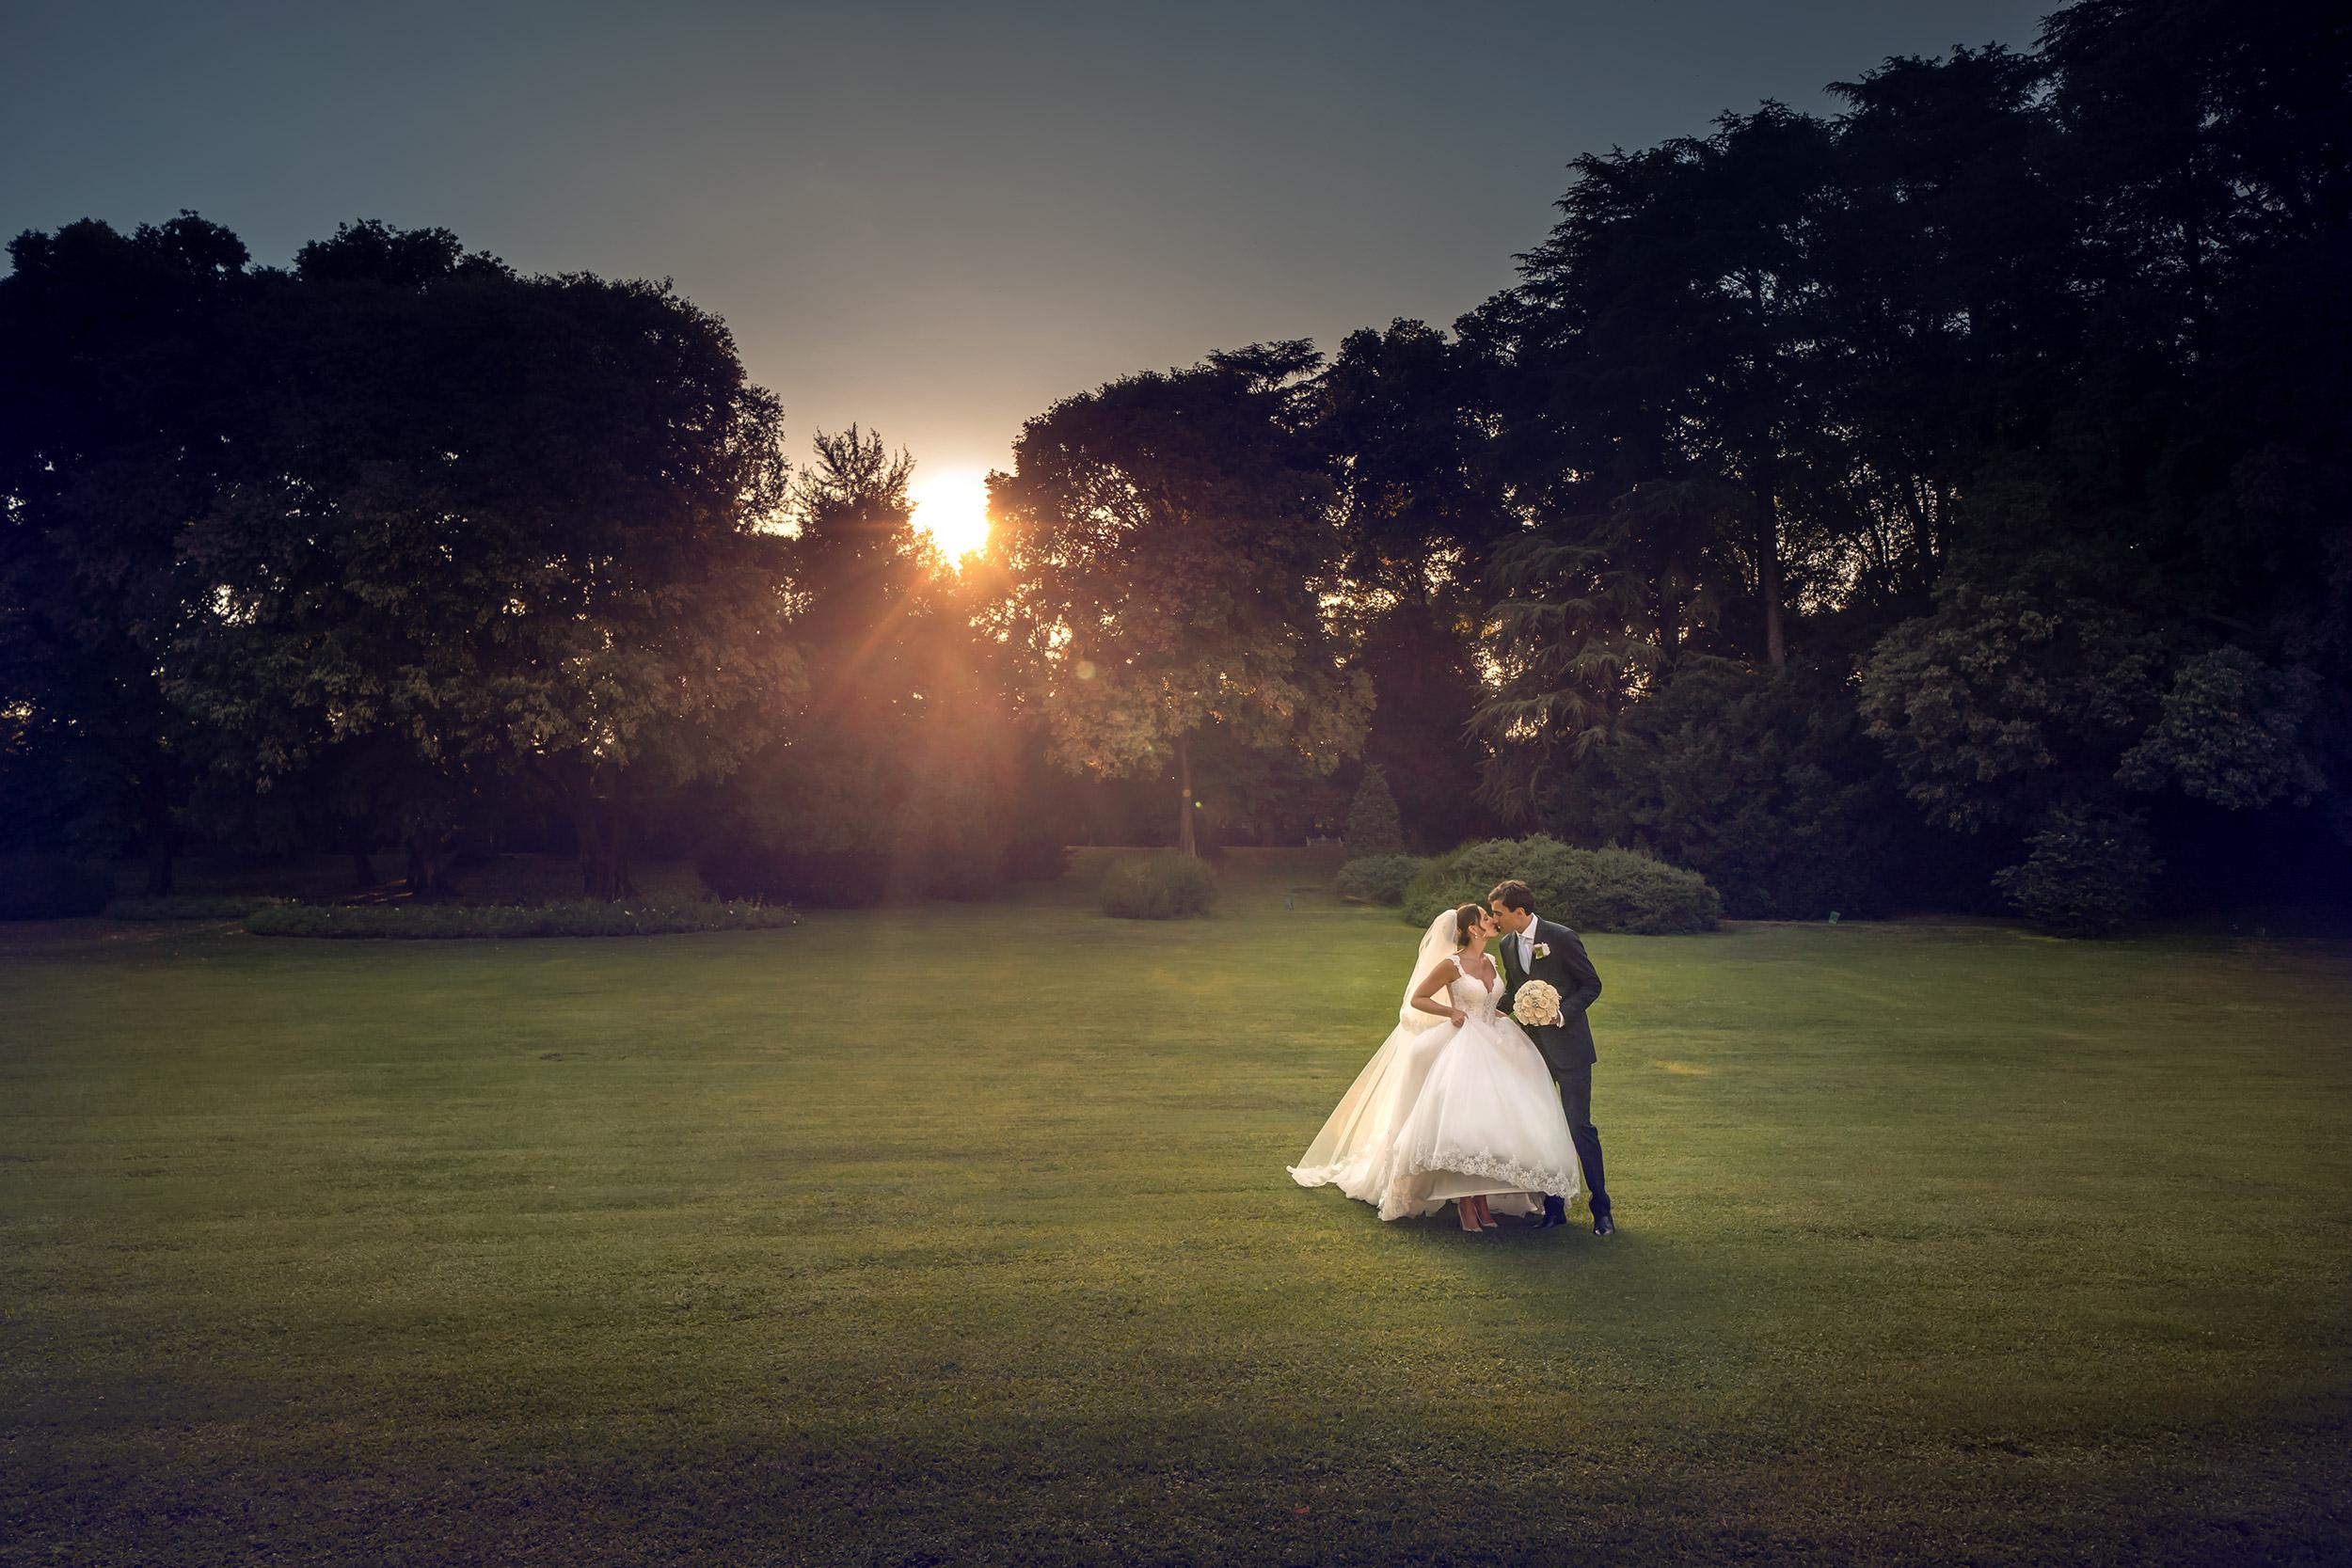 000 reportage wedding sposi foto matrimonio villa zanchi bergamo 1